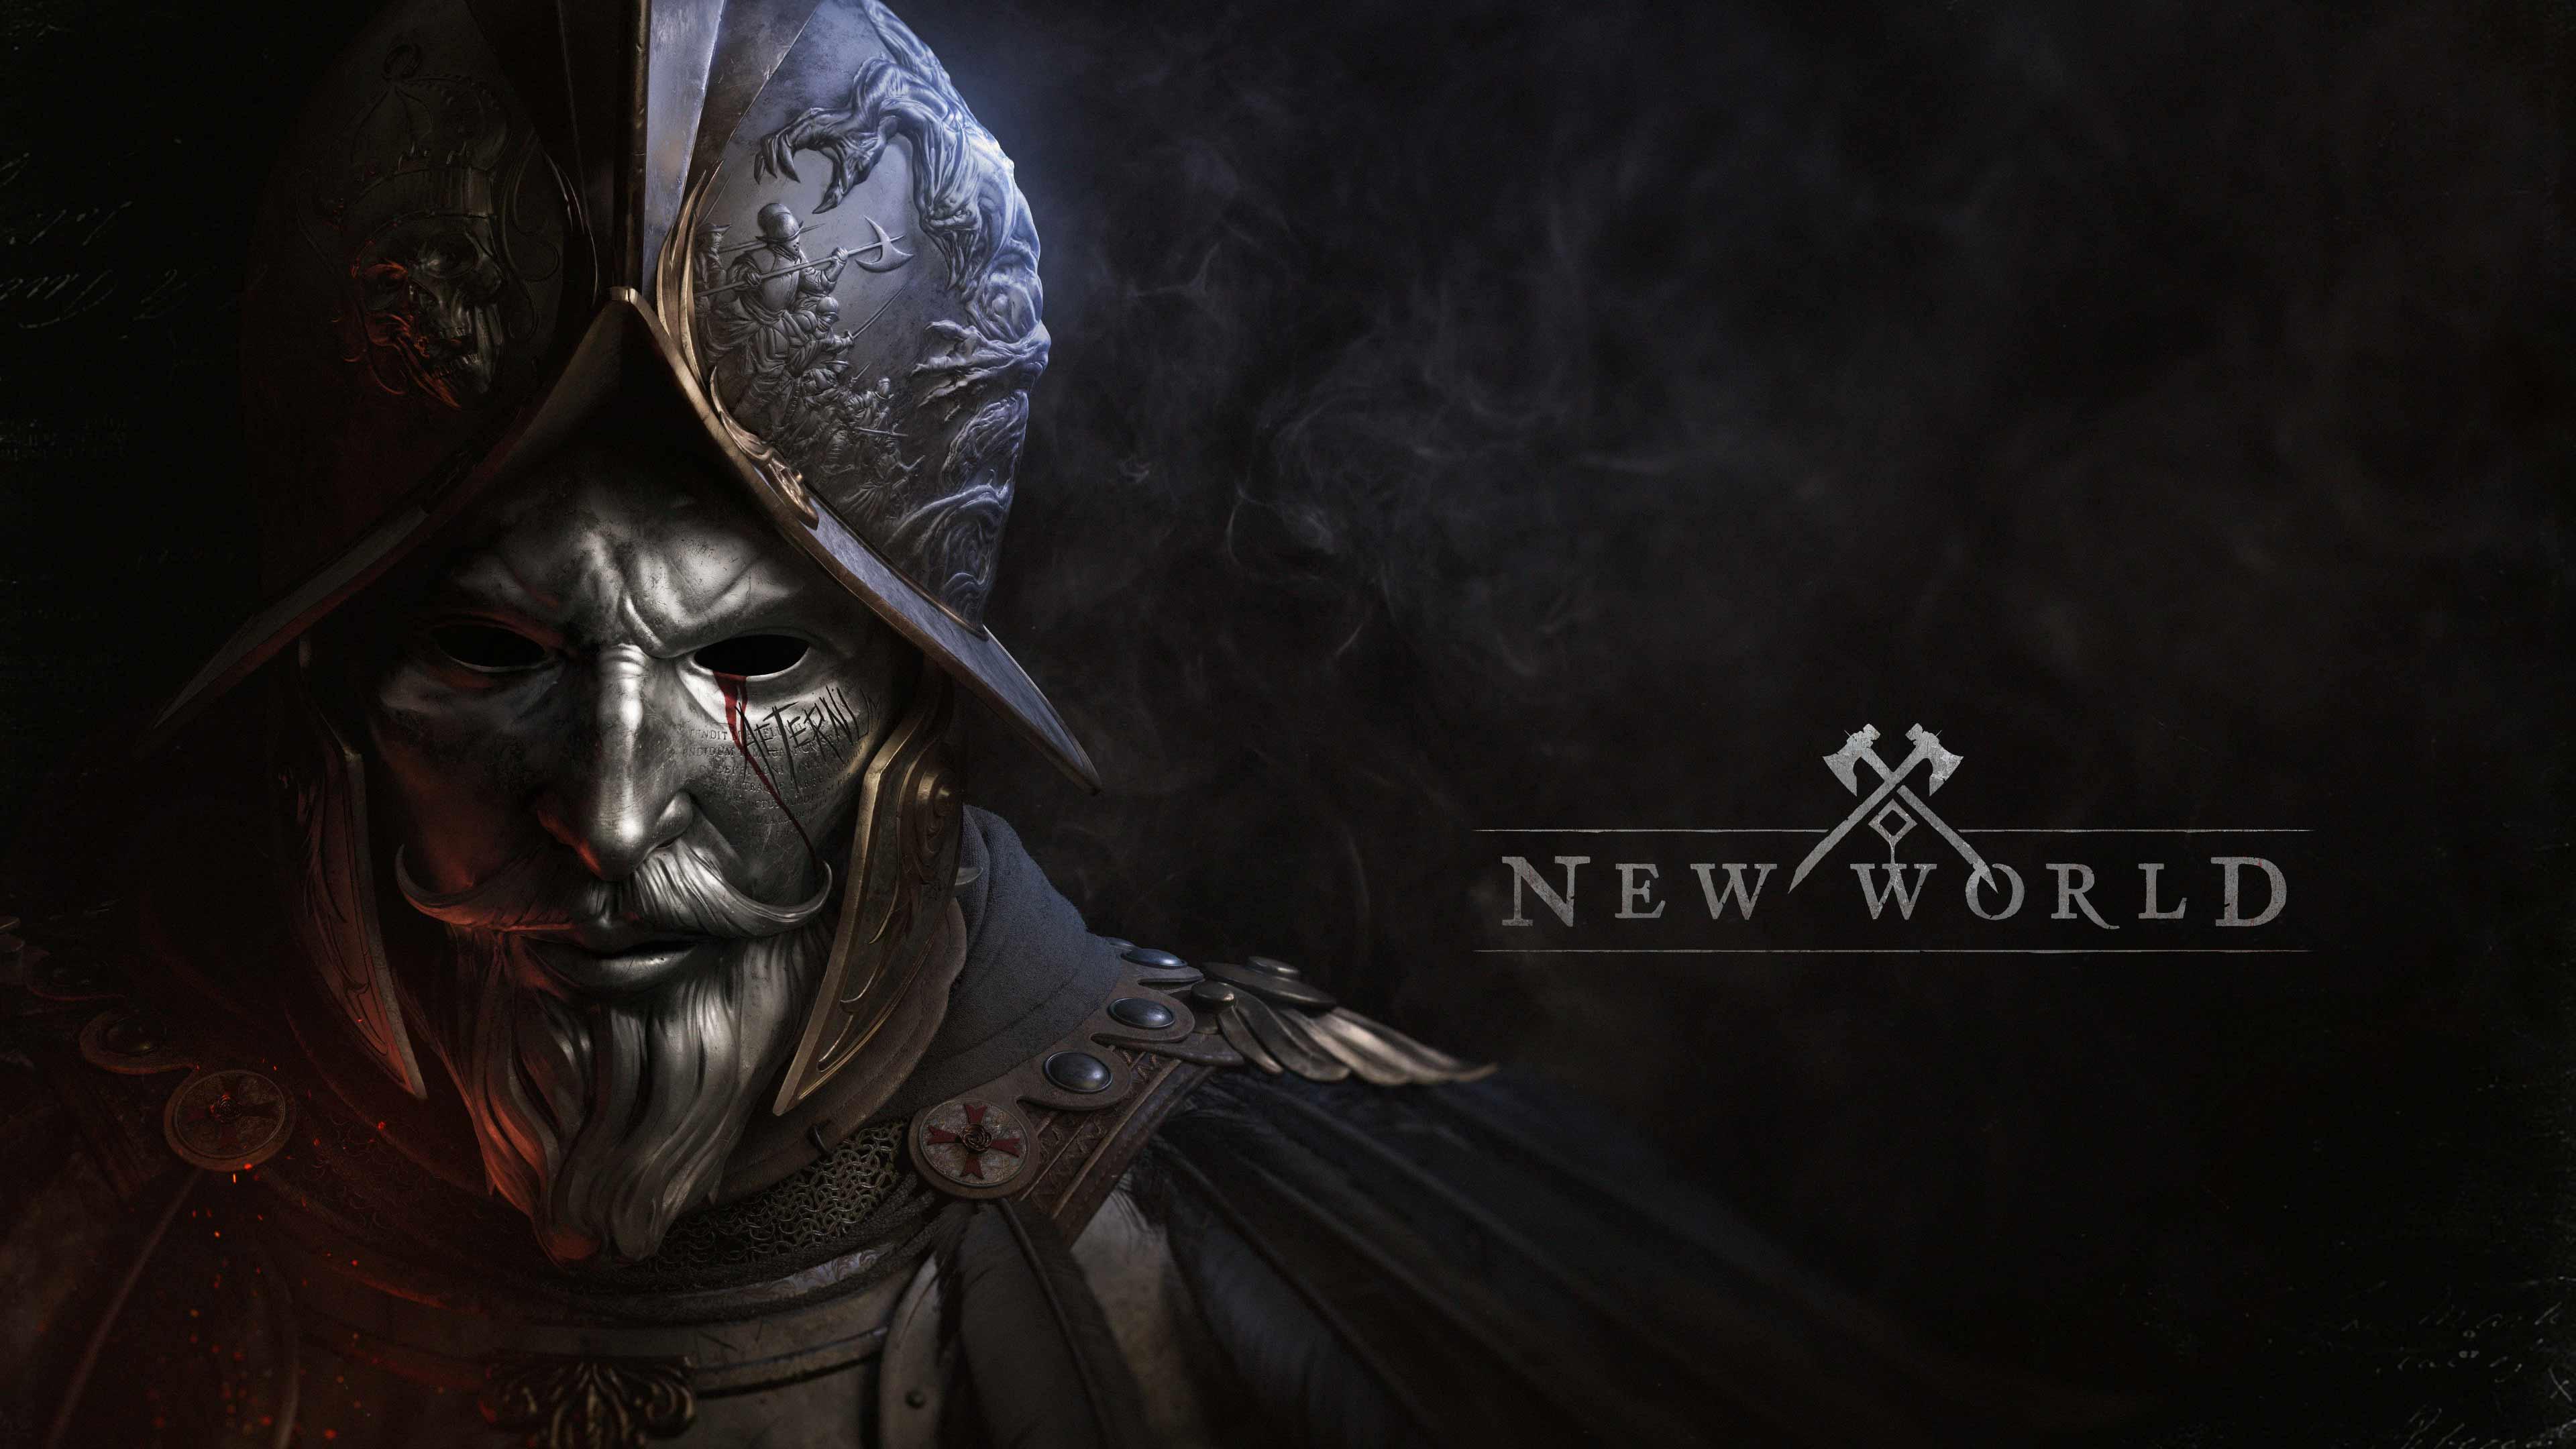 The New World logo alongside a masked explorer whose helmet has engravings of monsters